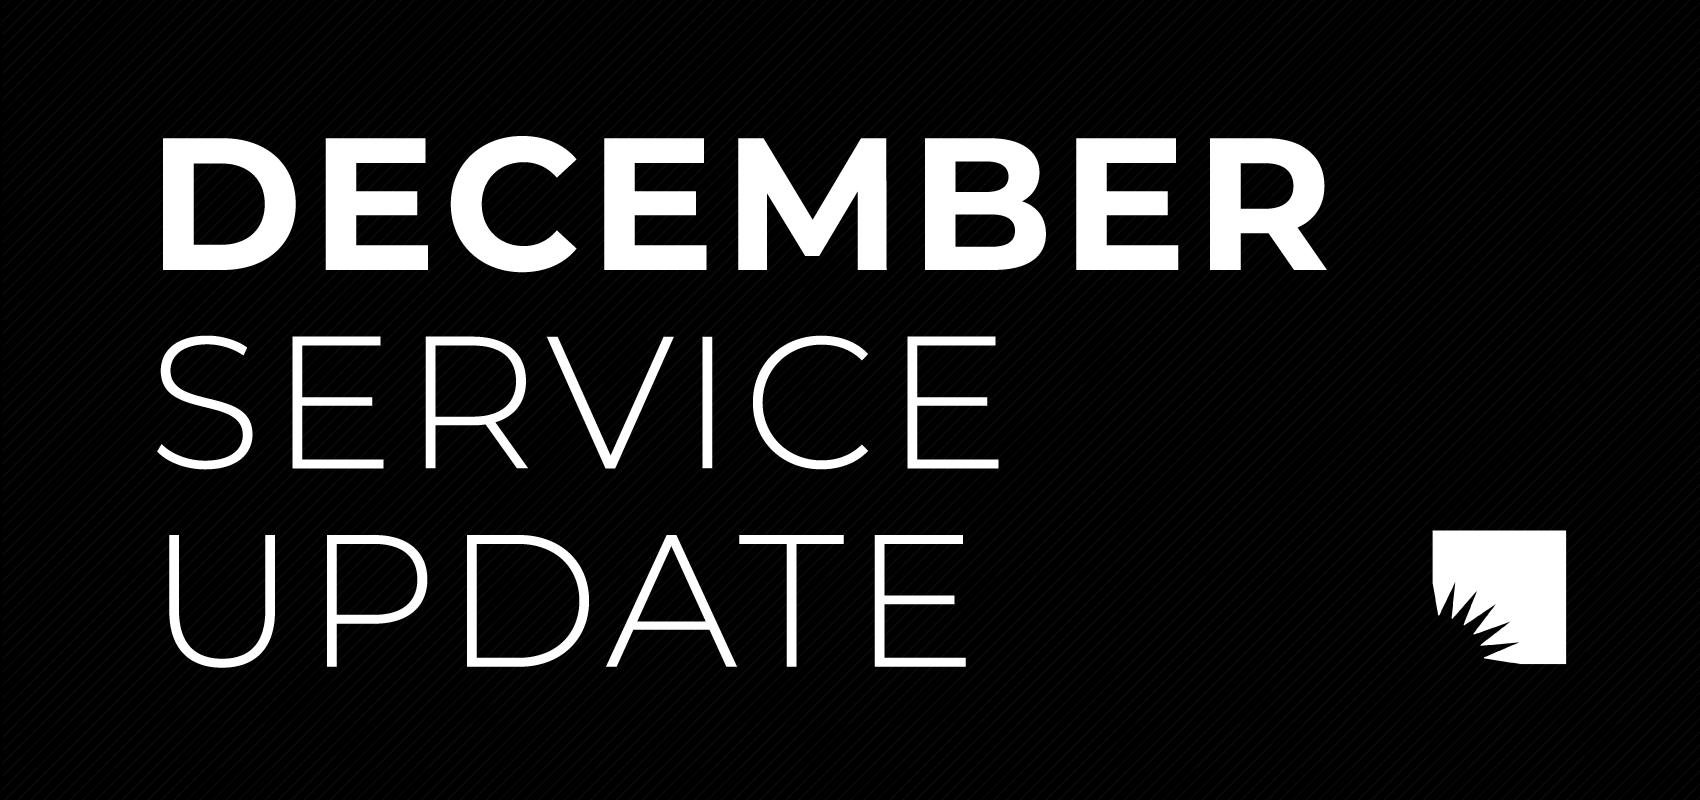 DECEMBER UPDATE (11/30). .